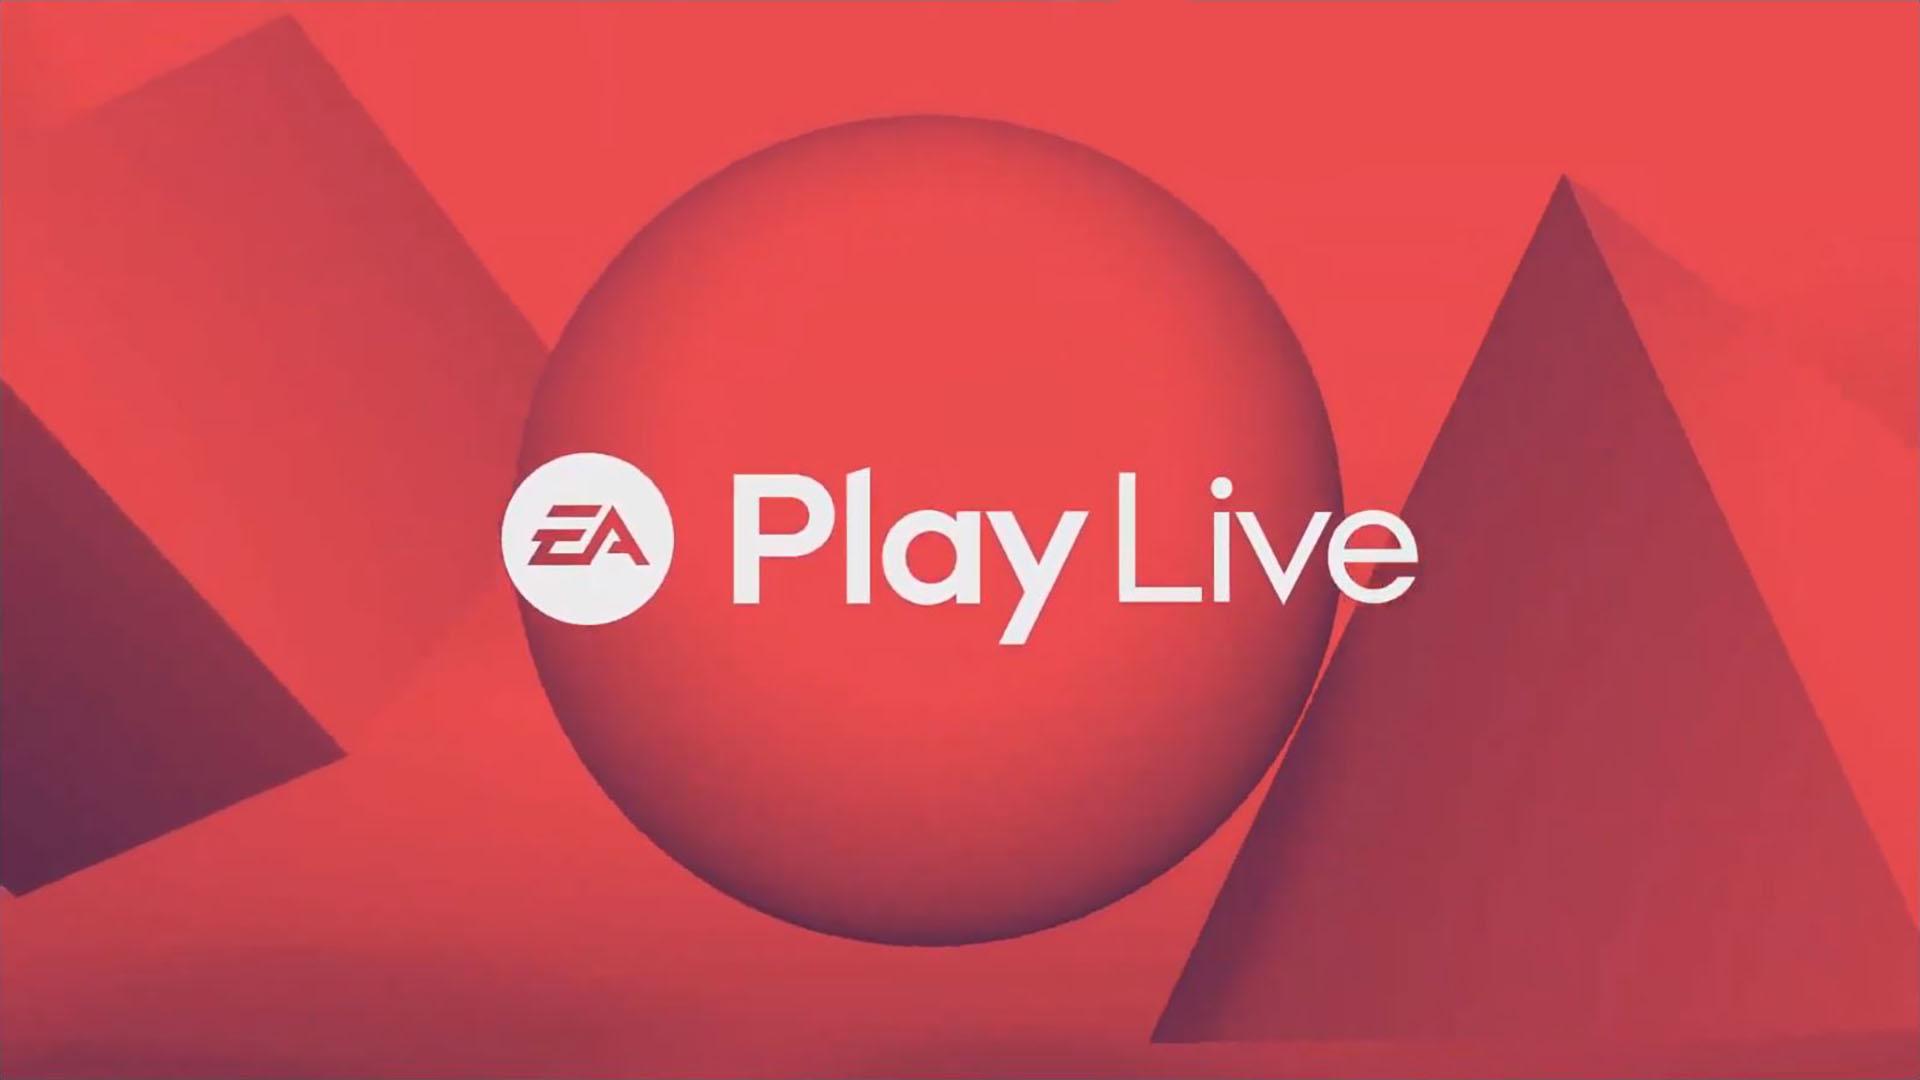 EA Play Live-oyunpat